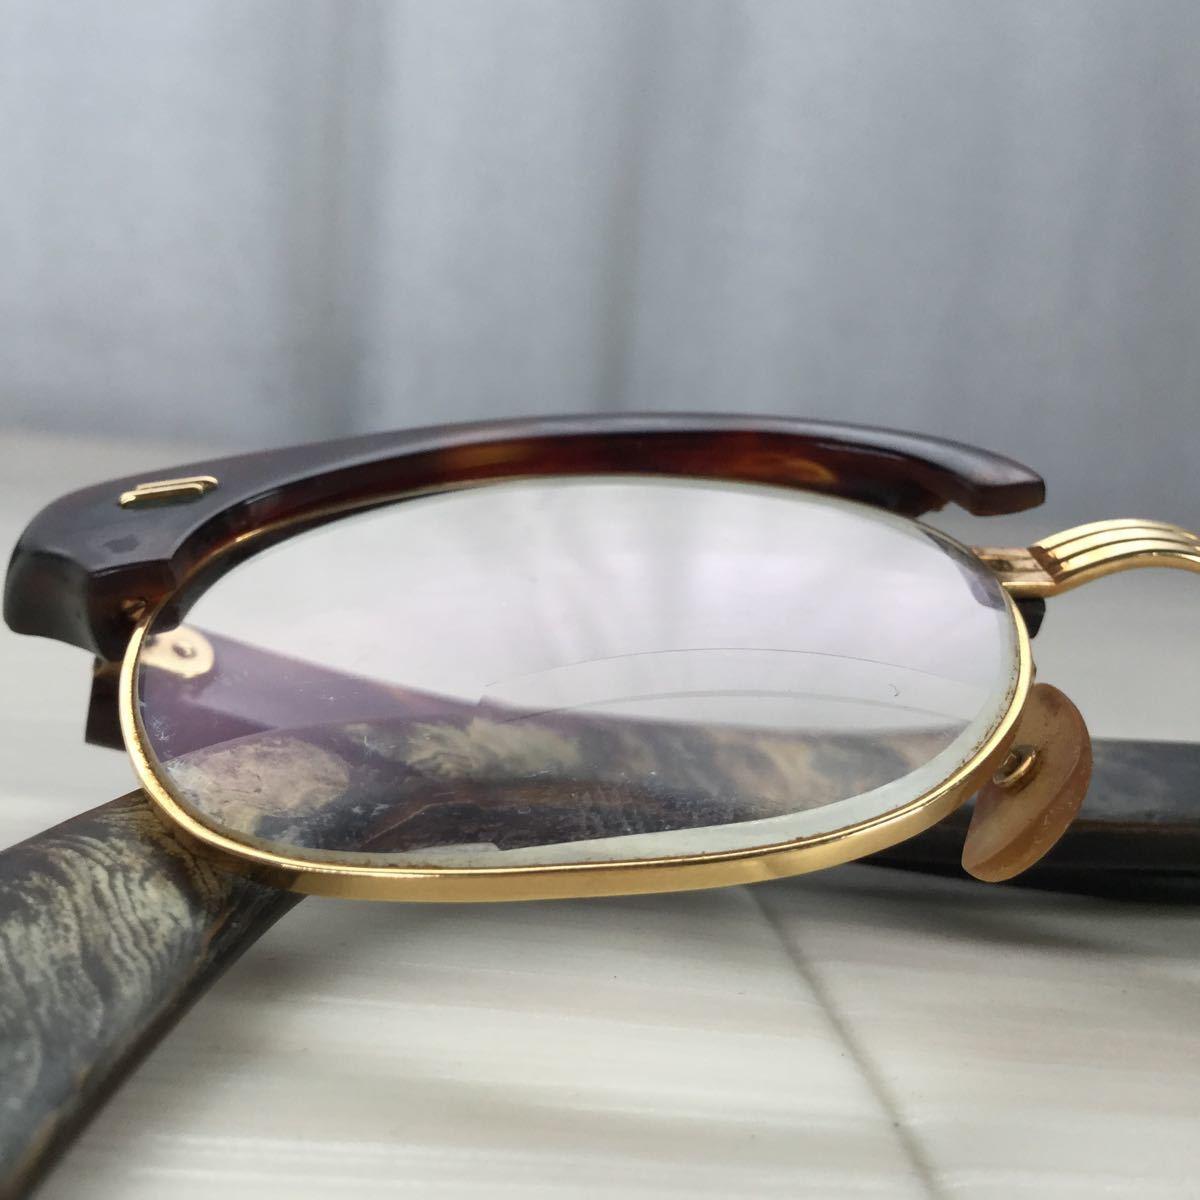 60s 鼈甲 べっ甲 べっこう メガネ 眼鏡 めがね 眼鏡フレーム 金 k18 18金 ゴールド 茶 総重量 約44g_画像8